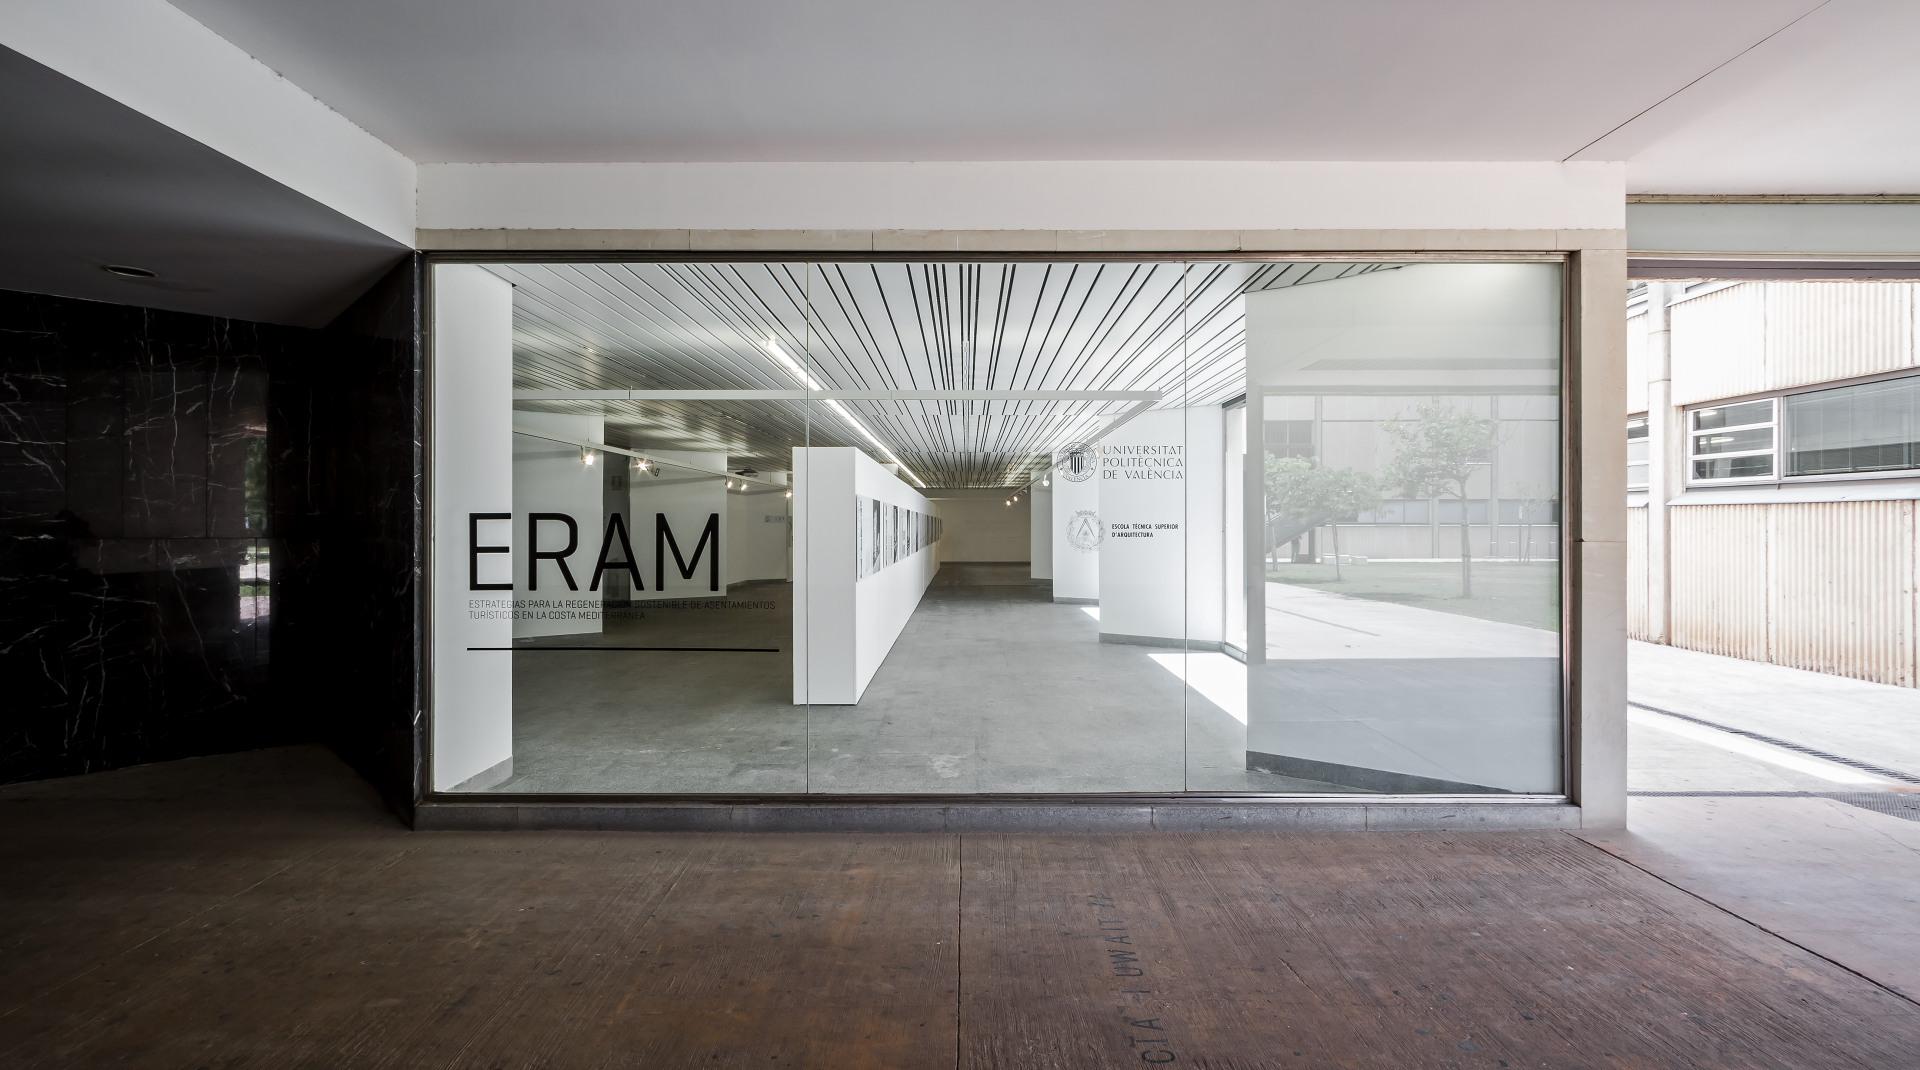 fotografia-arquitectura-valencia-german-cabo-upv-etsav-eram-exposicion (1)